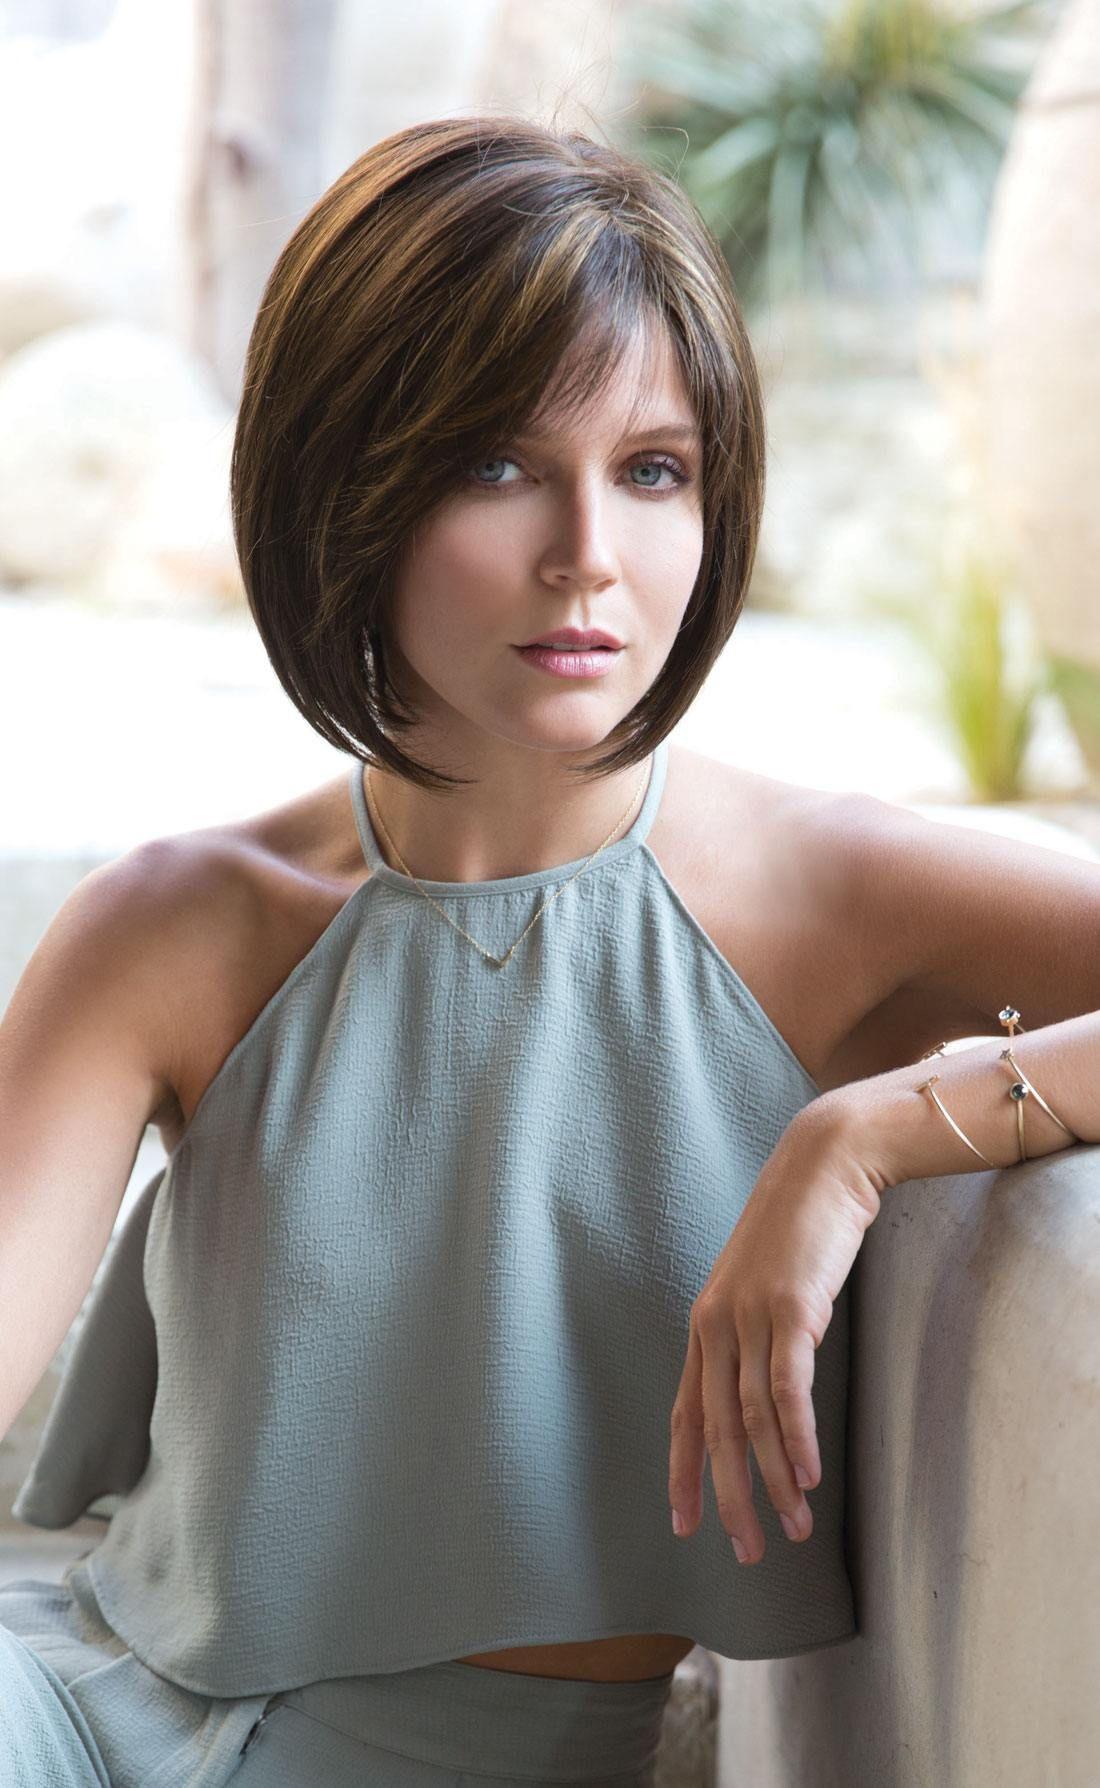 Jolie W 2019 Fryzury Hair Styles Short Hair Styles I